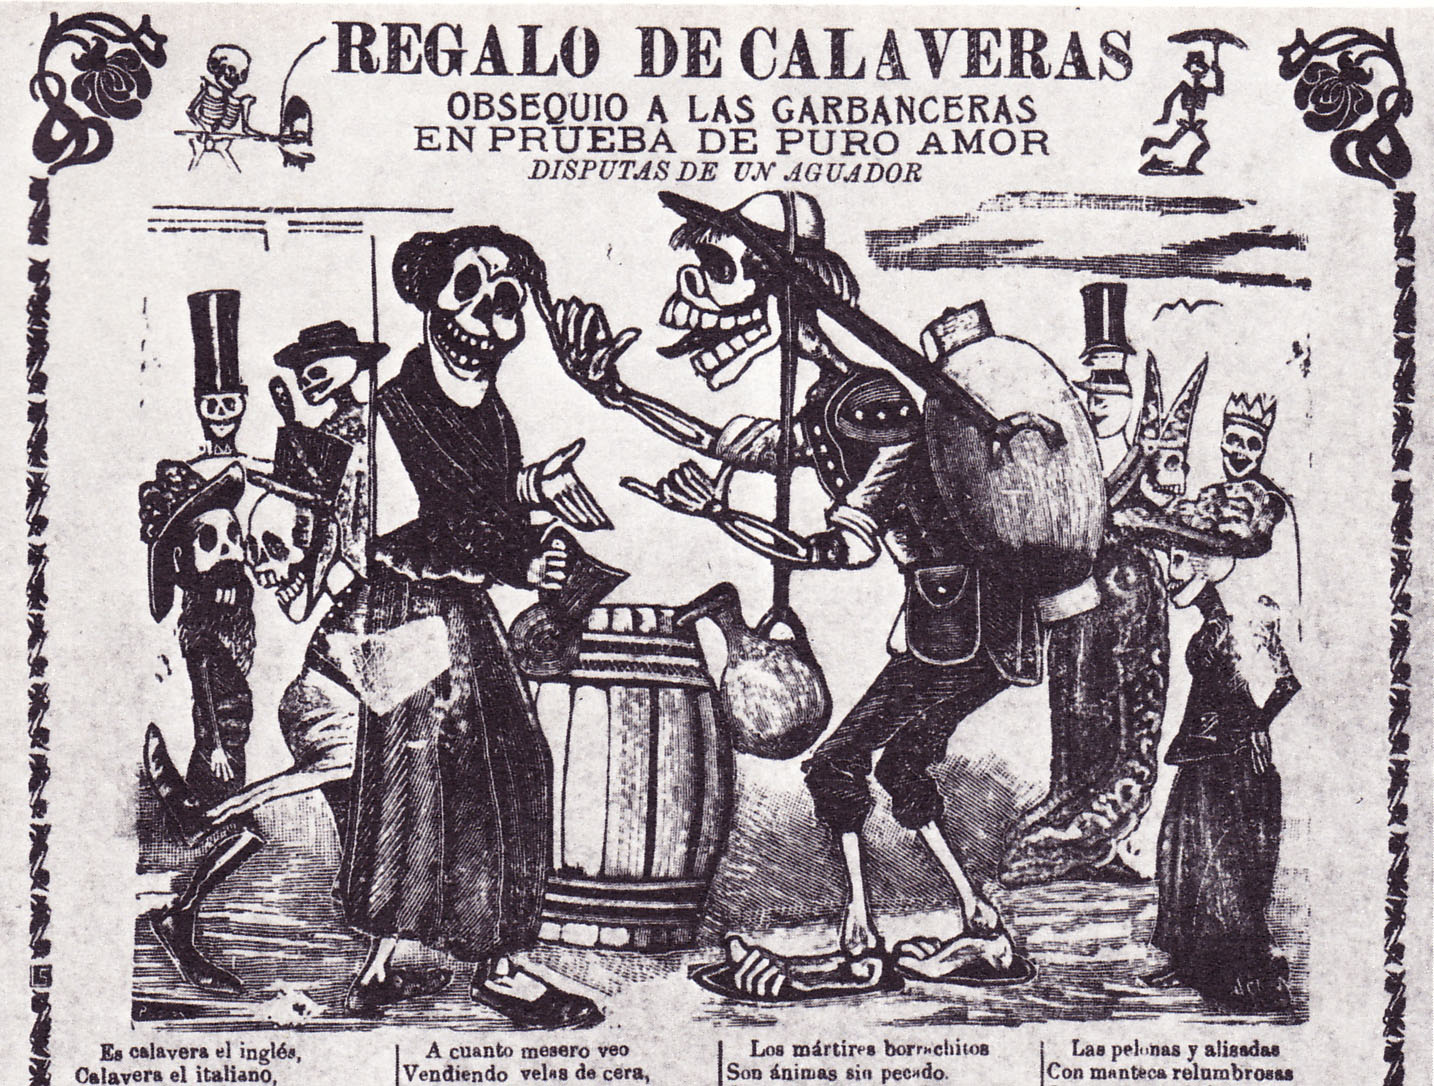 Morbid Anatomy Santa Muerte Posada S Mexico And The End Of Times